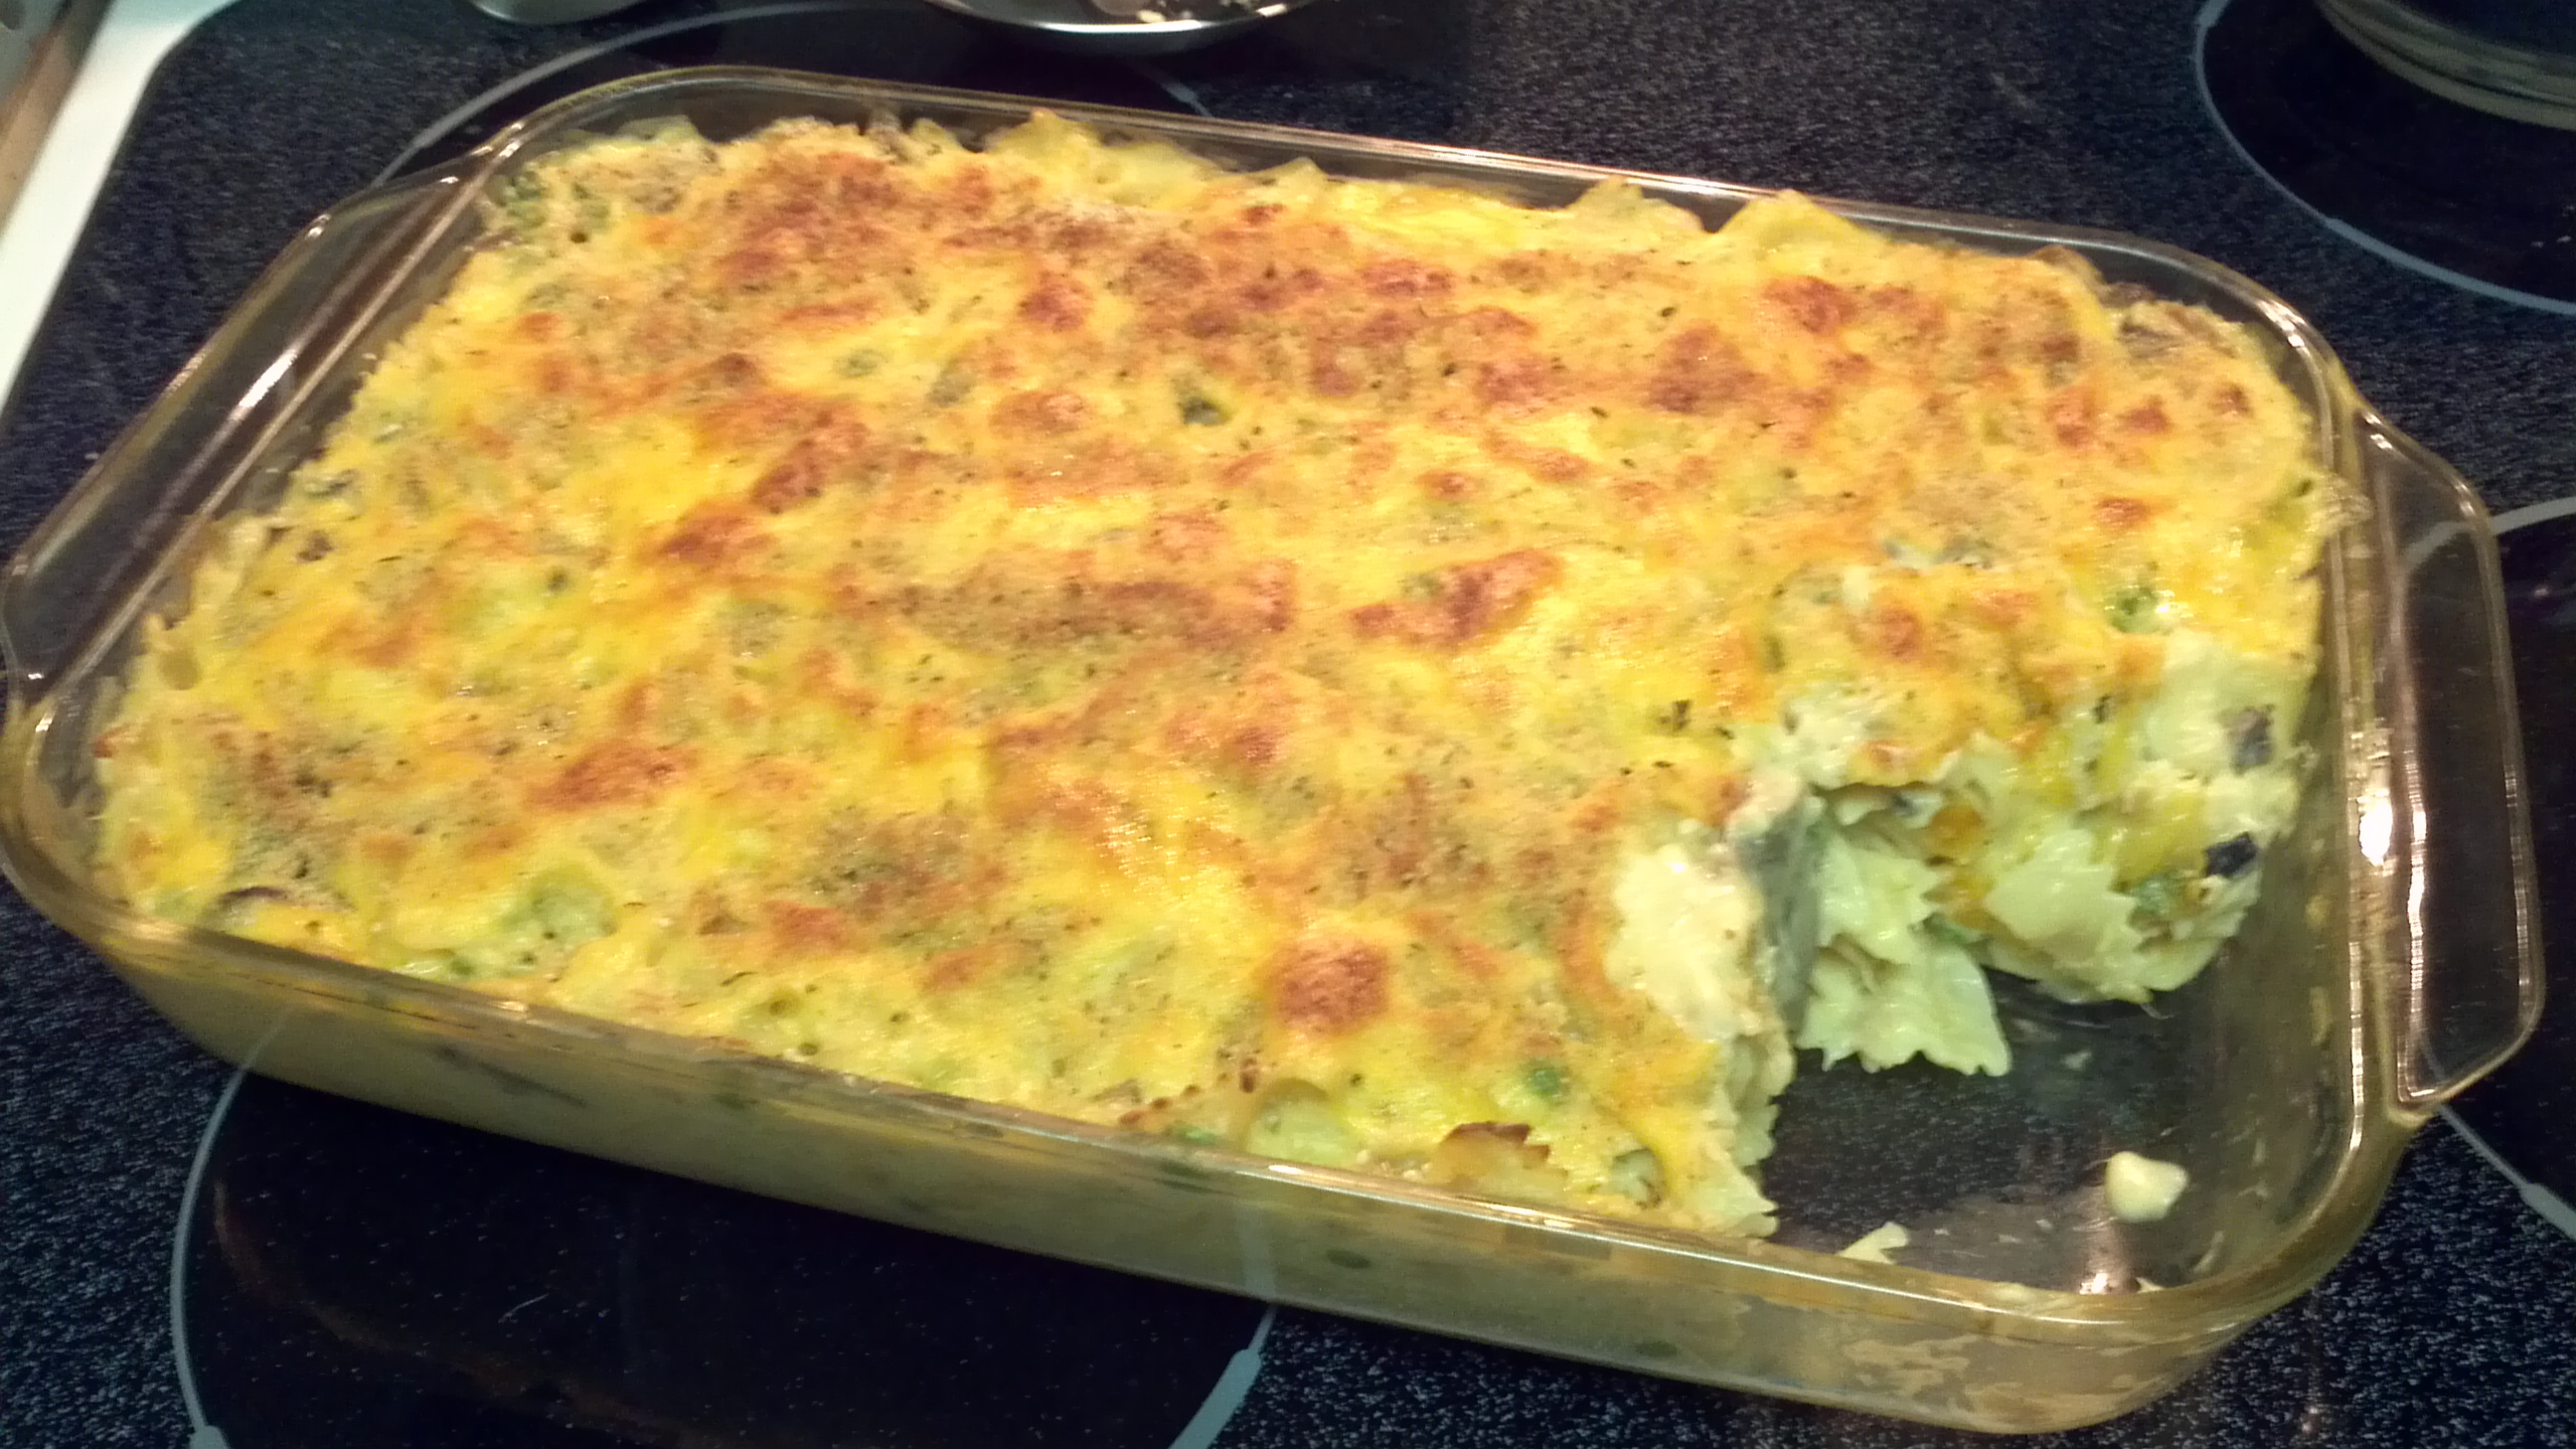 tuna-and-macaroni-casserole.jpg